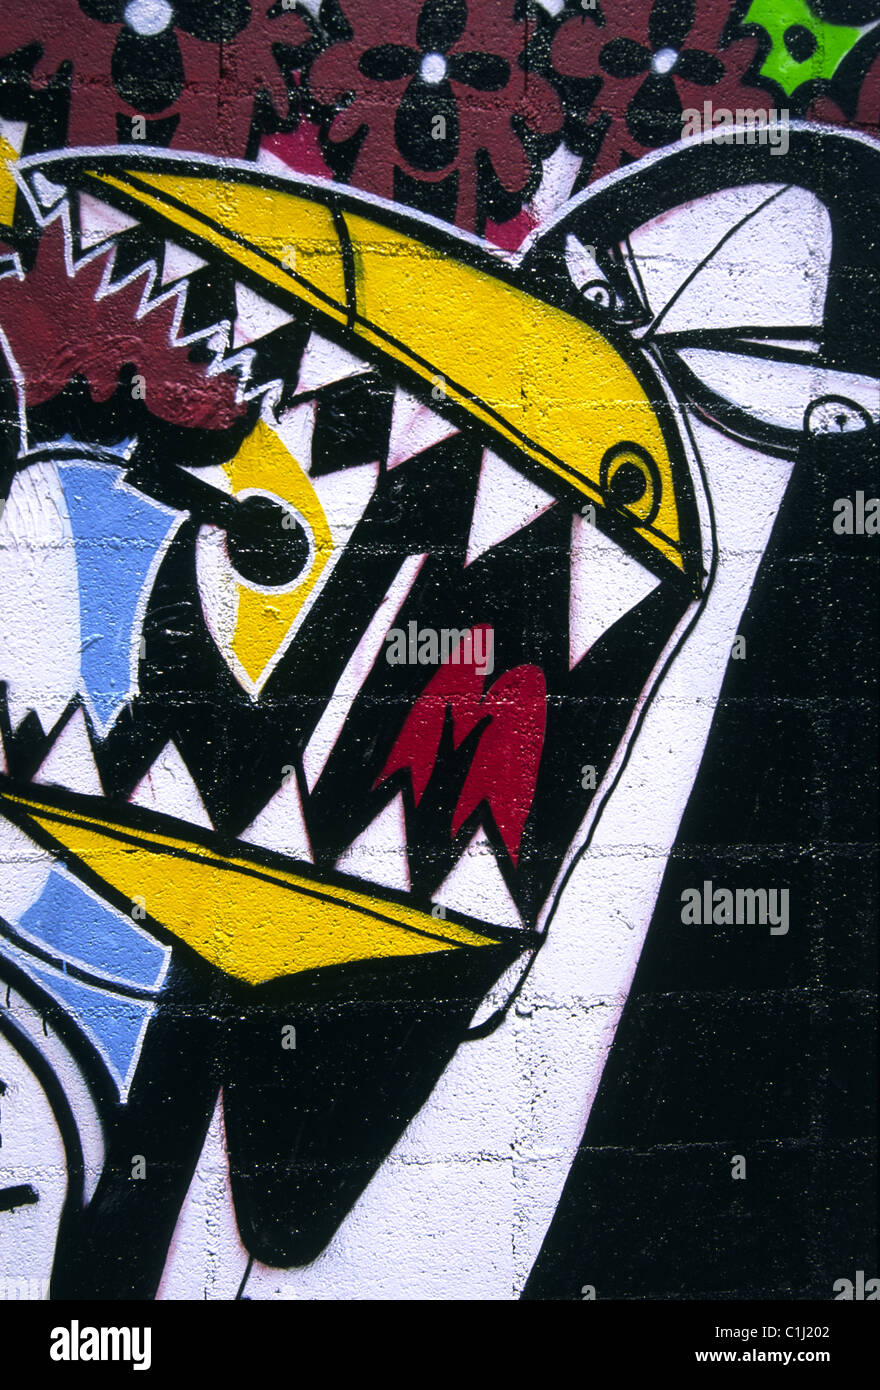 Graffiti wall barcelona - Cartoon Graffiti Image Of Crazy Looking Enraged Singing Penguin With Sharp Teeth Painted On Brick Wall Barcelona Spain